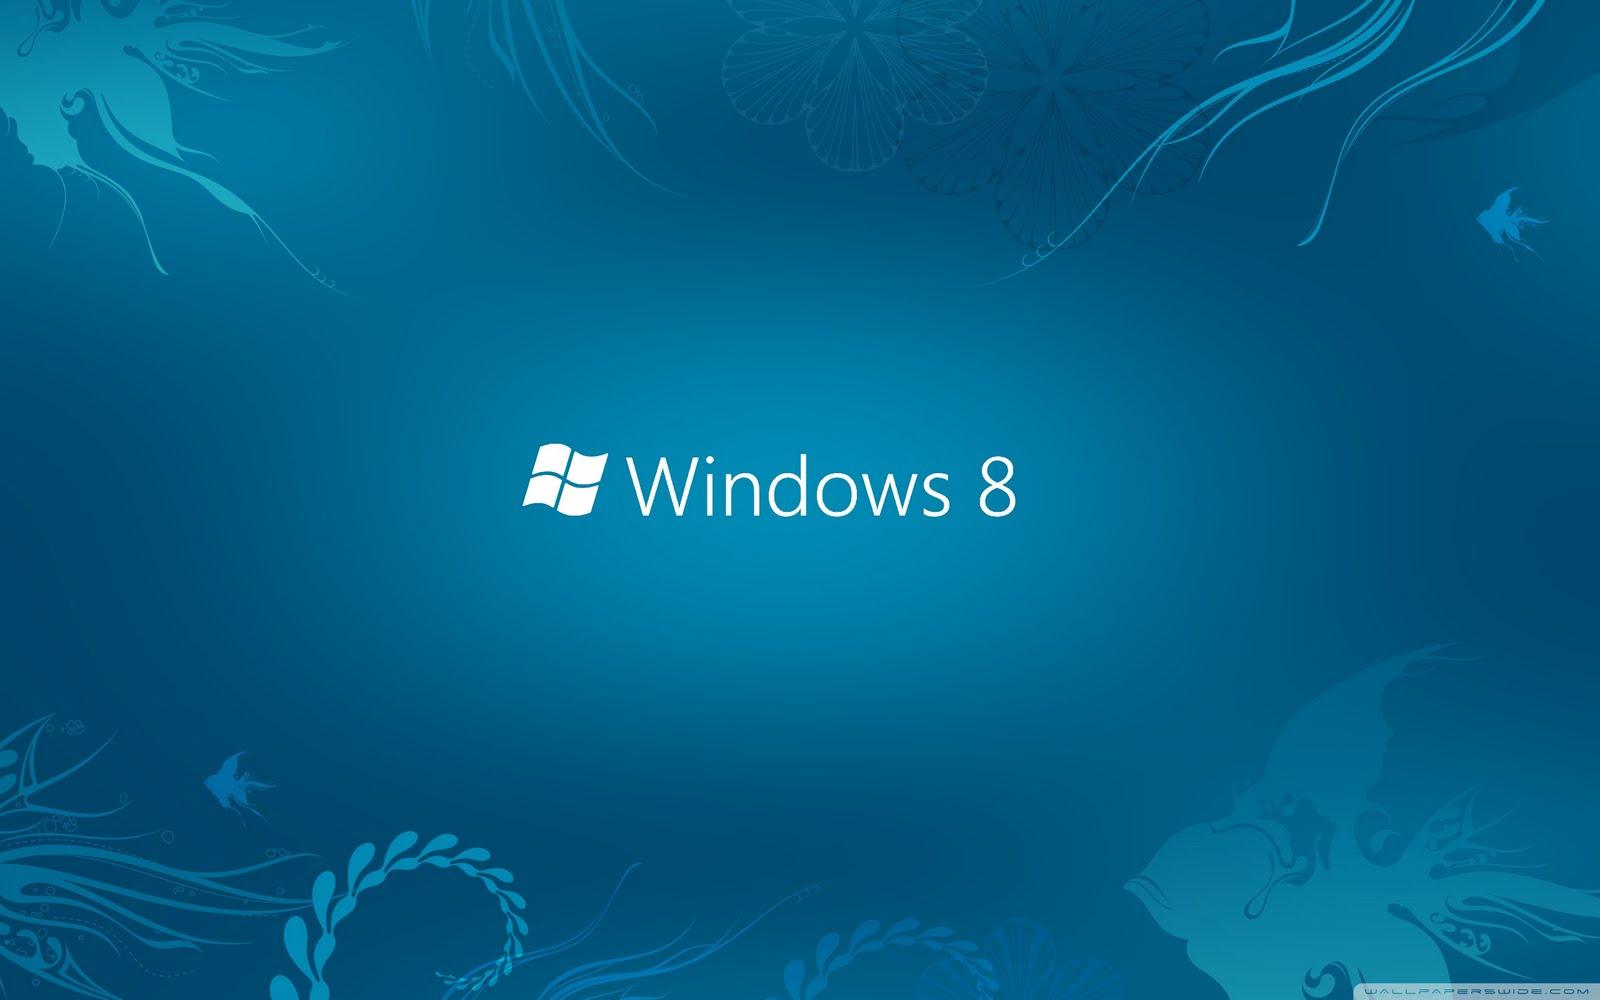 Top 12 Cool Windows 8 HD wallpapers for desktop backgrounds 1600x1000